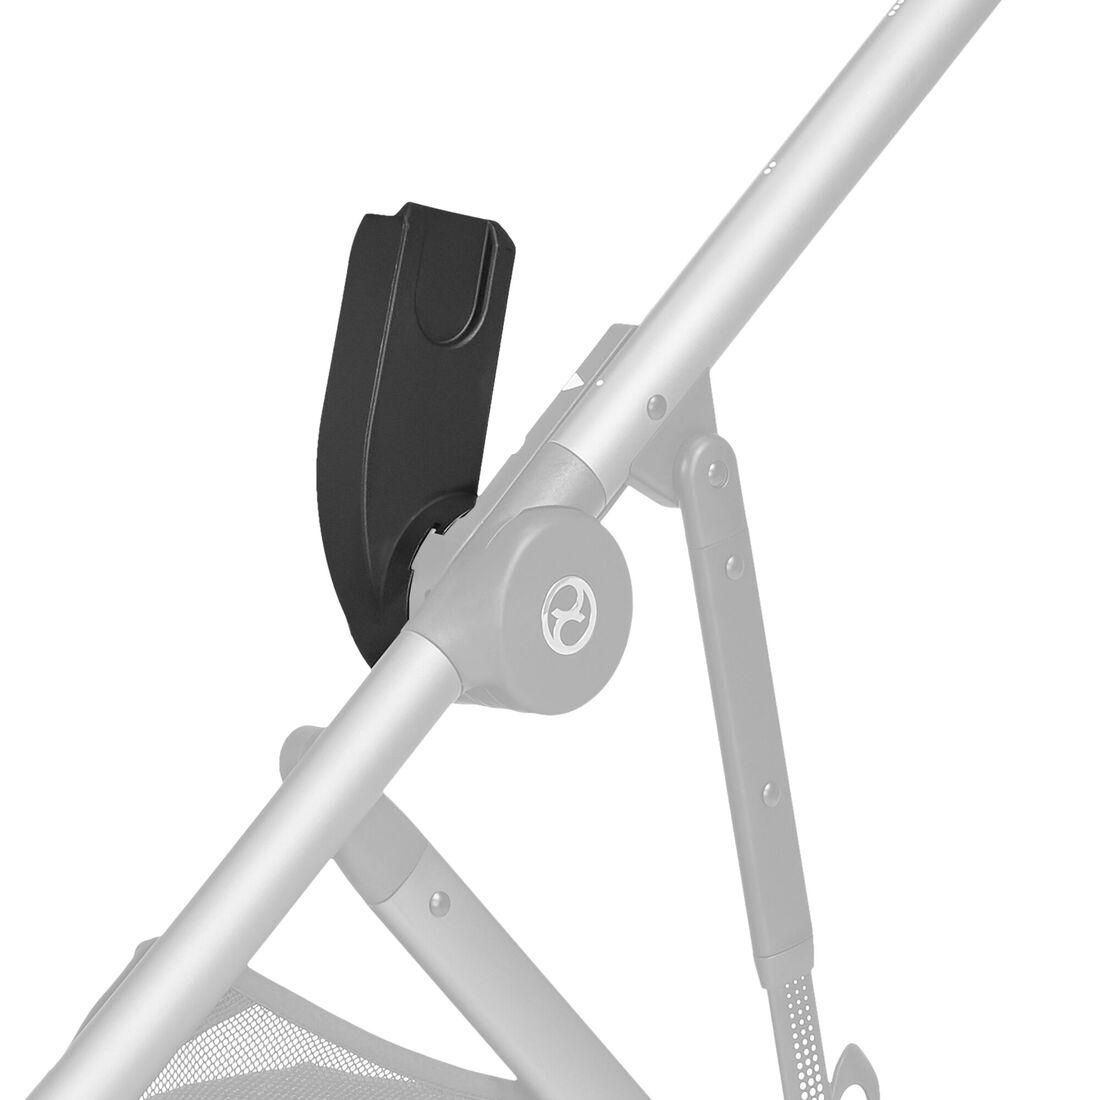 CYBEX Adapter Car Seat Gazelle S - Black in Black large image number 2